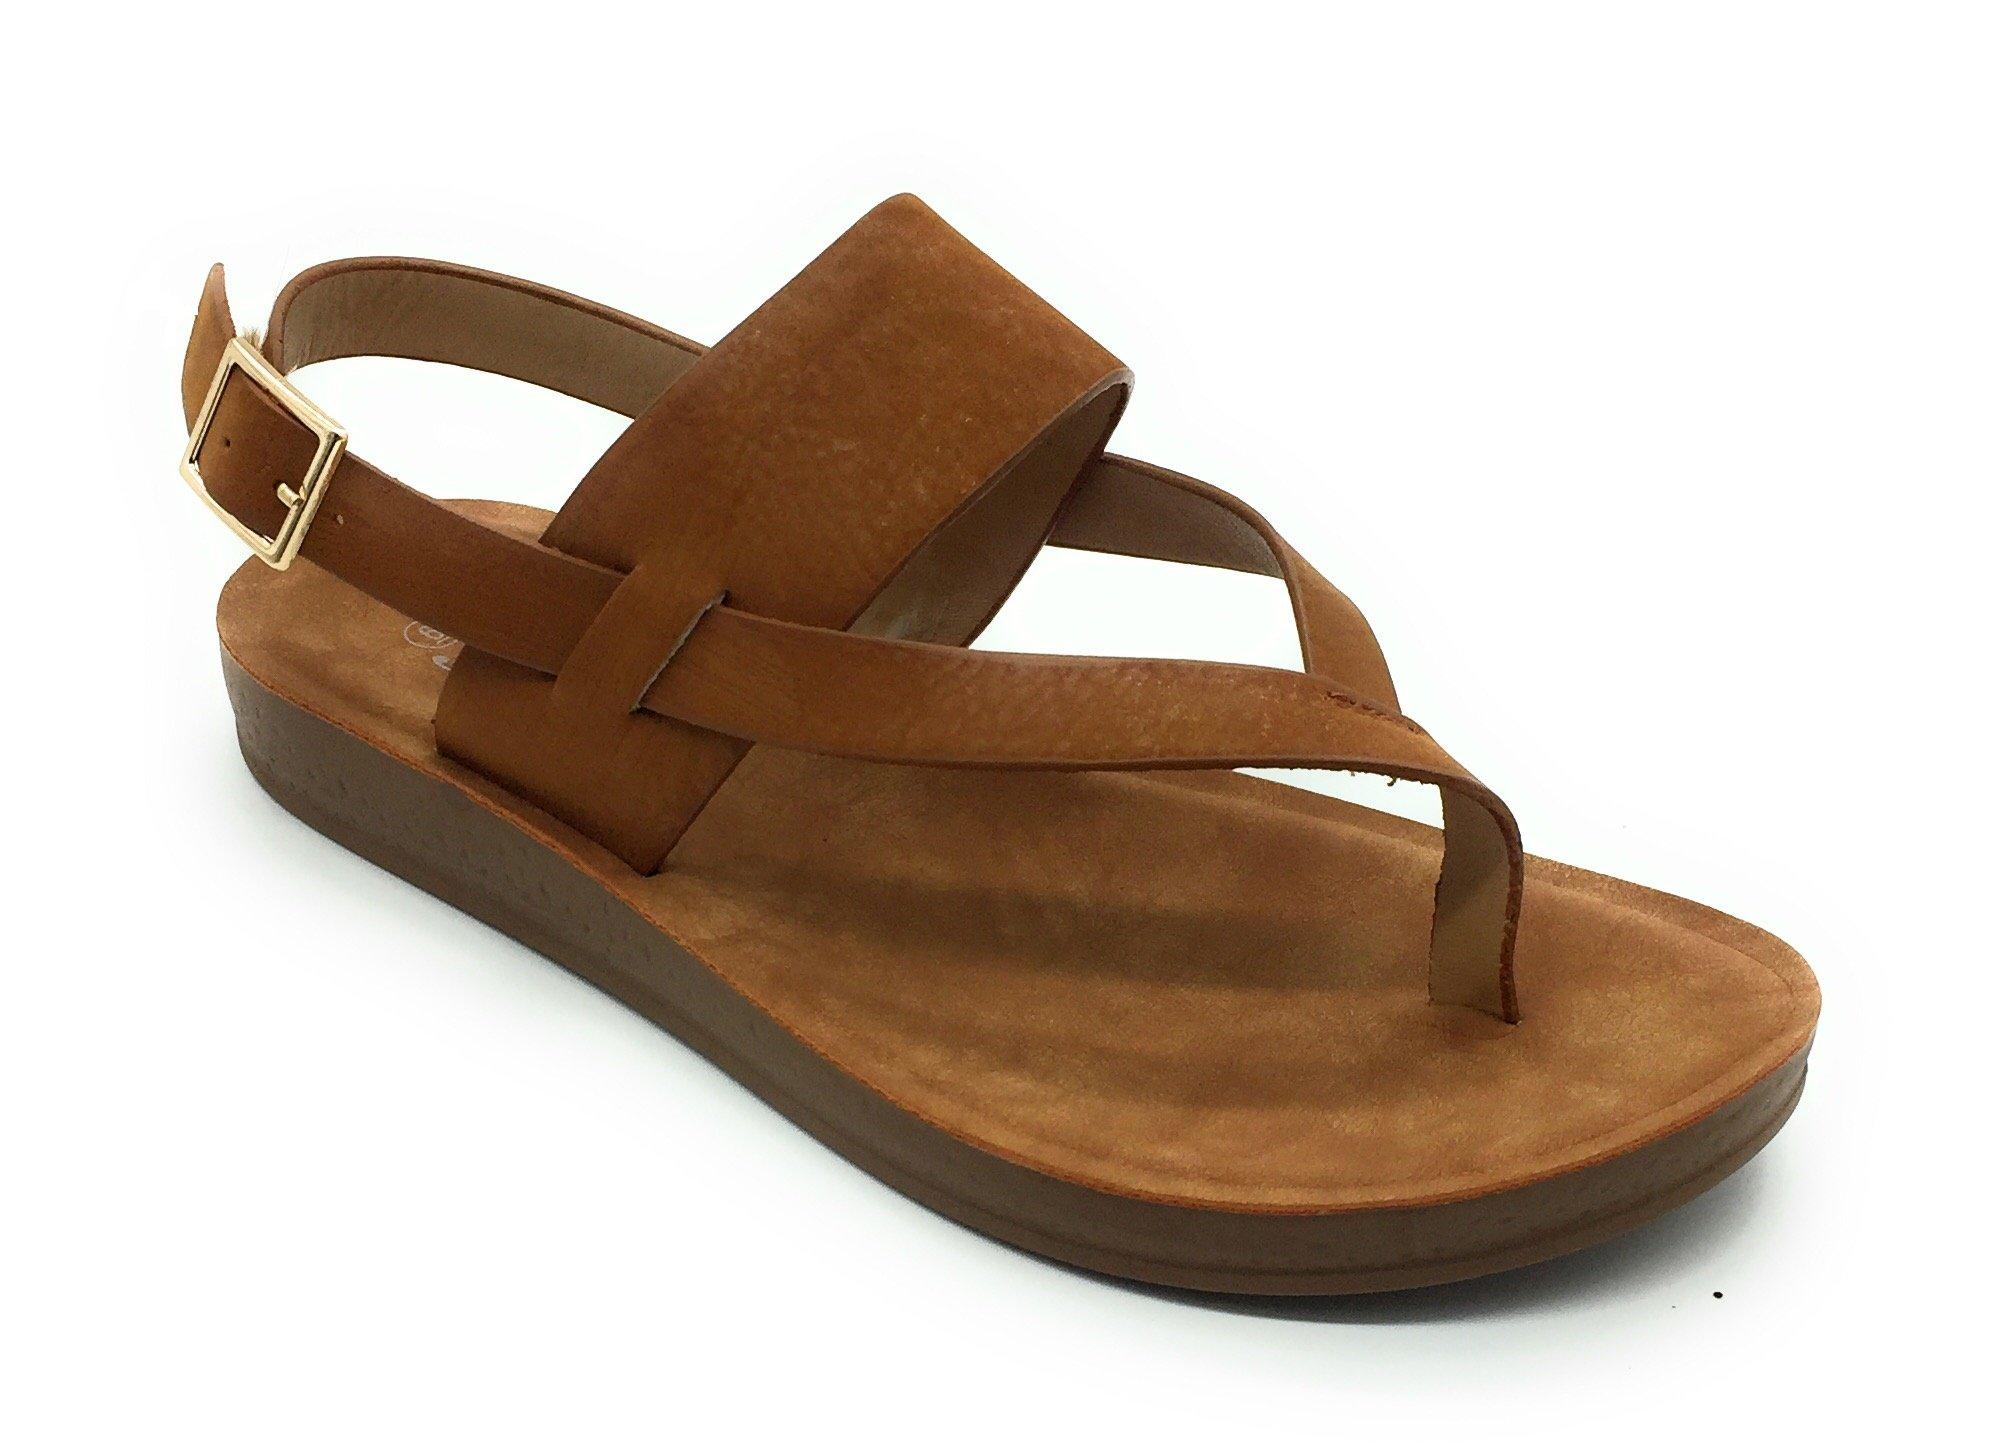 Women Cute Open Toe Comfortable Ankle Strap Platform Wedge Stylish Flexible Summer Flat Sandal, Tan 7.5(M) US